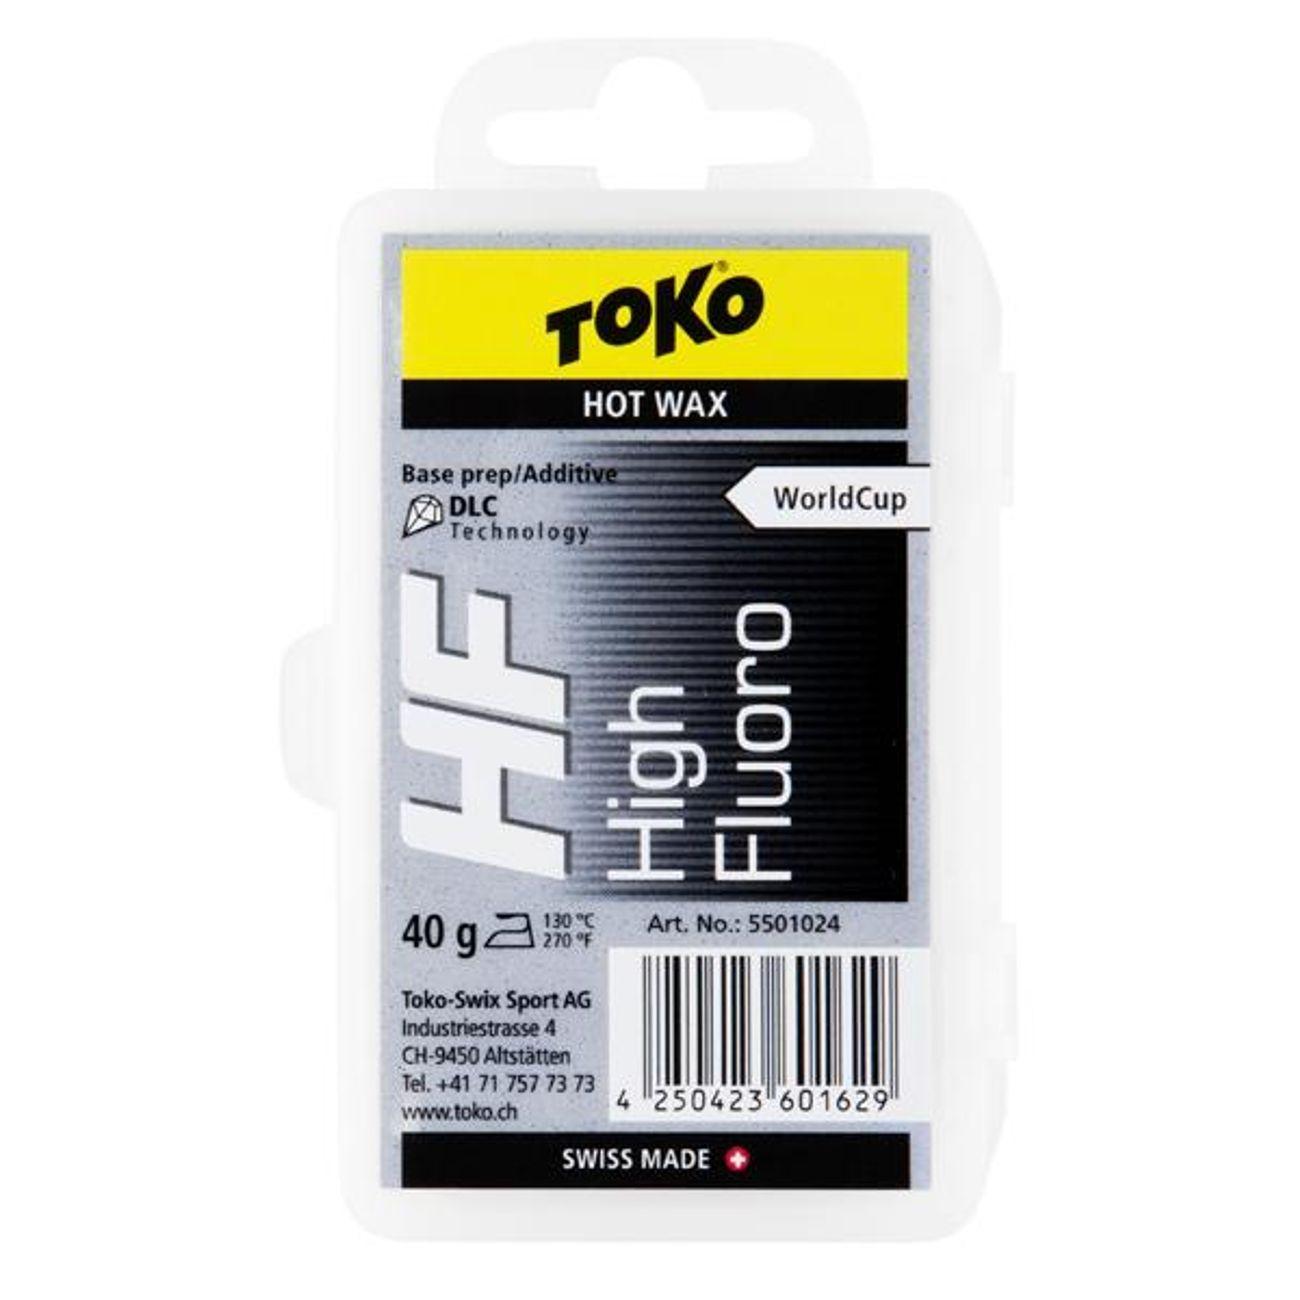 Glisse urbaine  TOKO Toko Hf Hot Wax 40gr